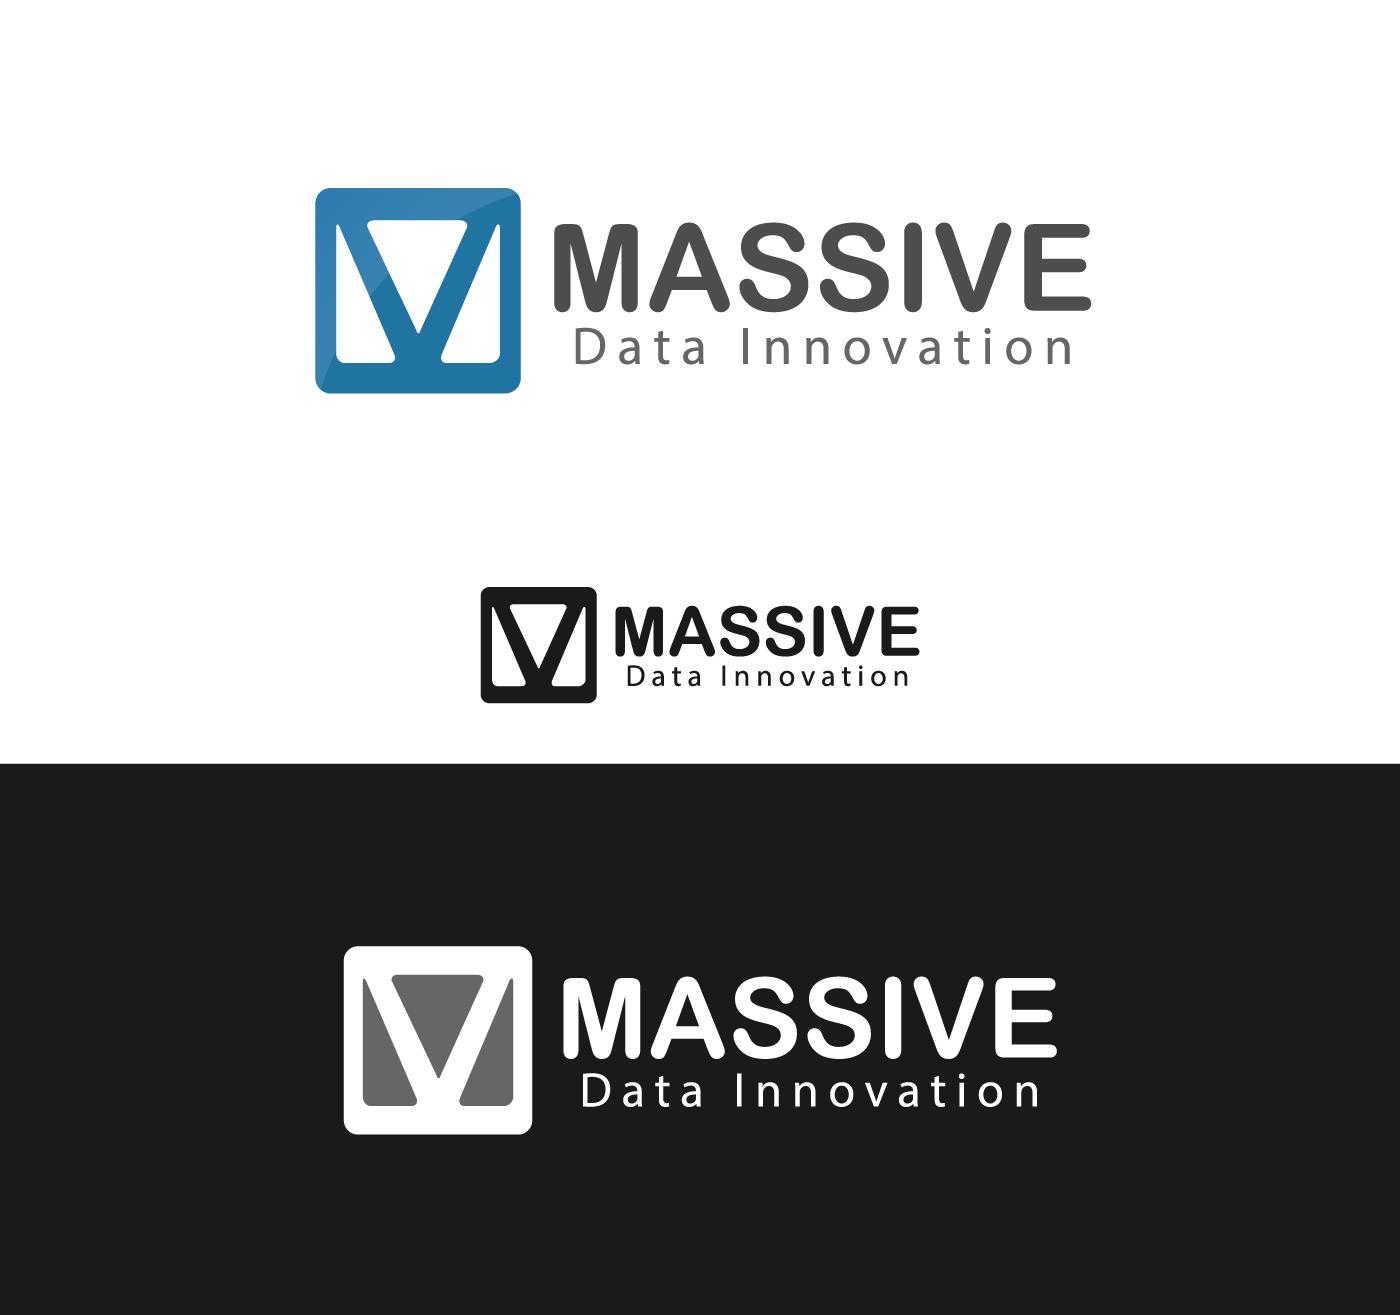 Logo Design by Sami Baig - Entry No. 492 in the Logo Design Contest MASSIVE LOGO.